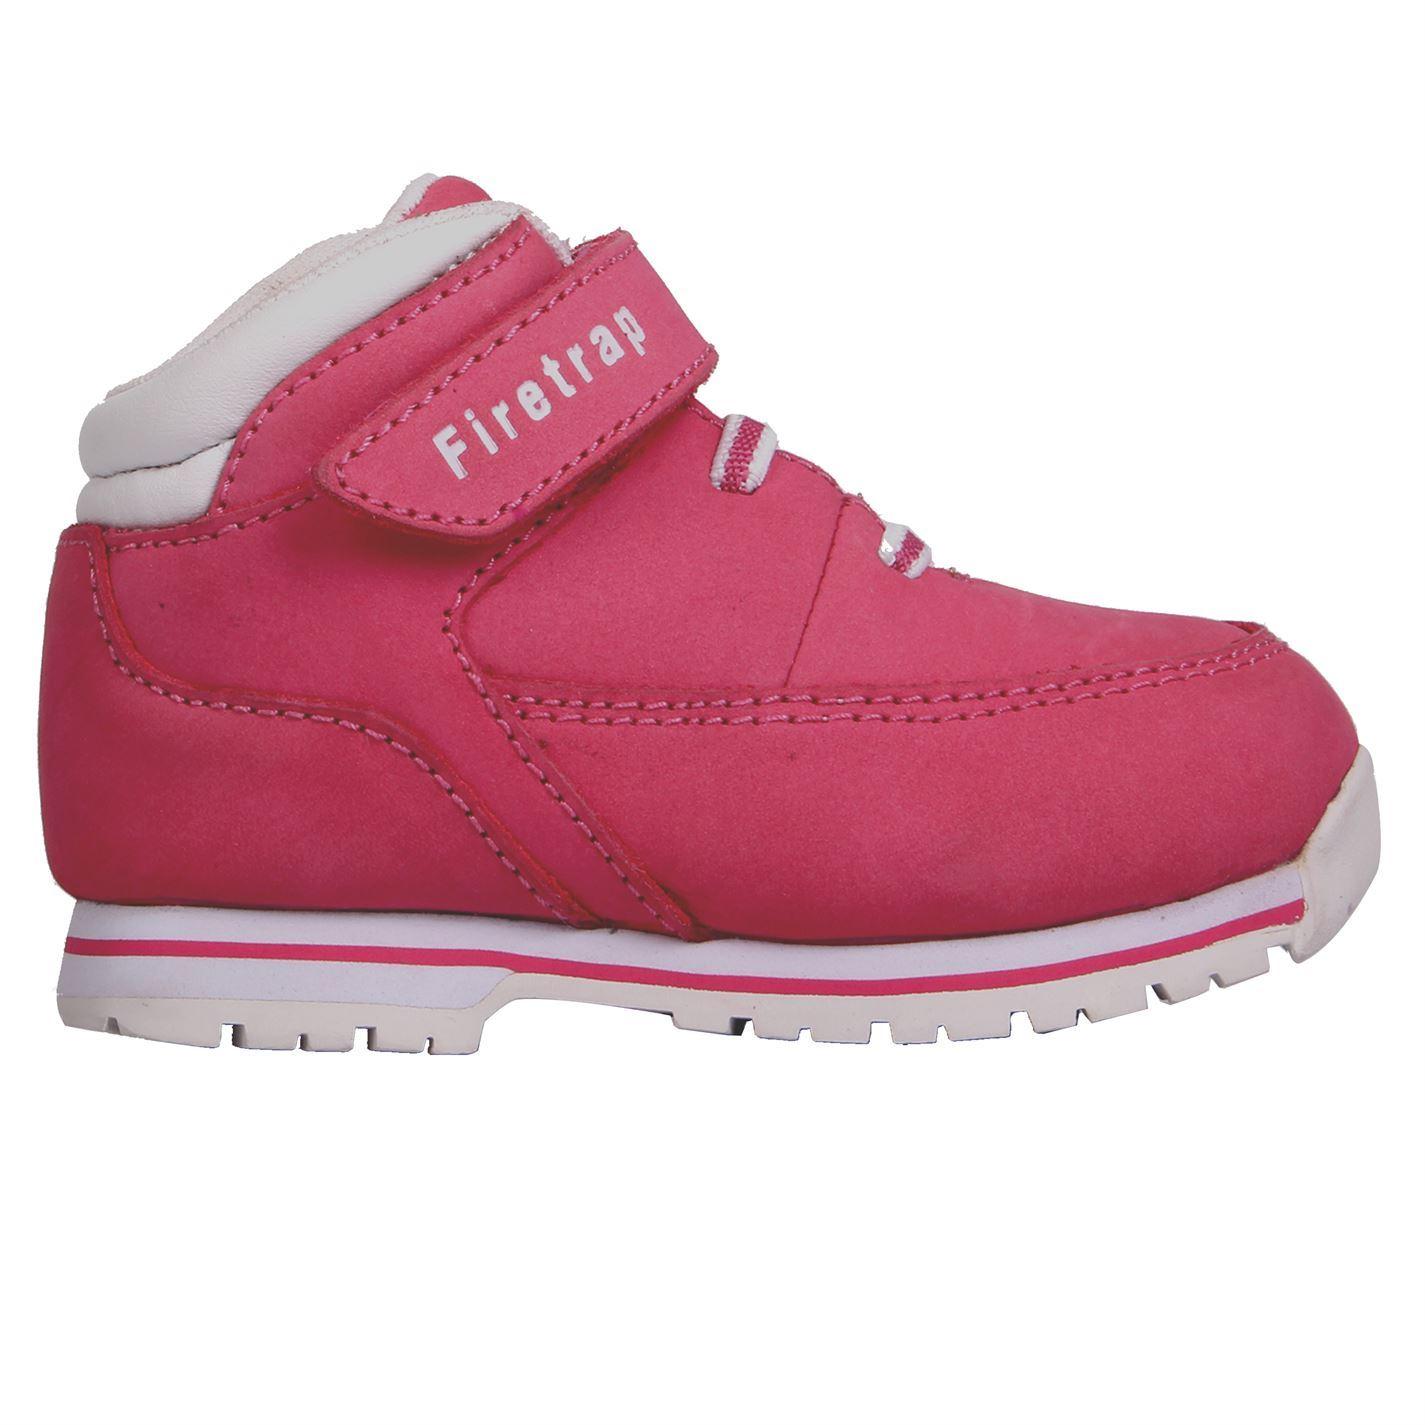 Firetrap Rhino Boots Infants Girls Pink